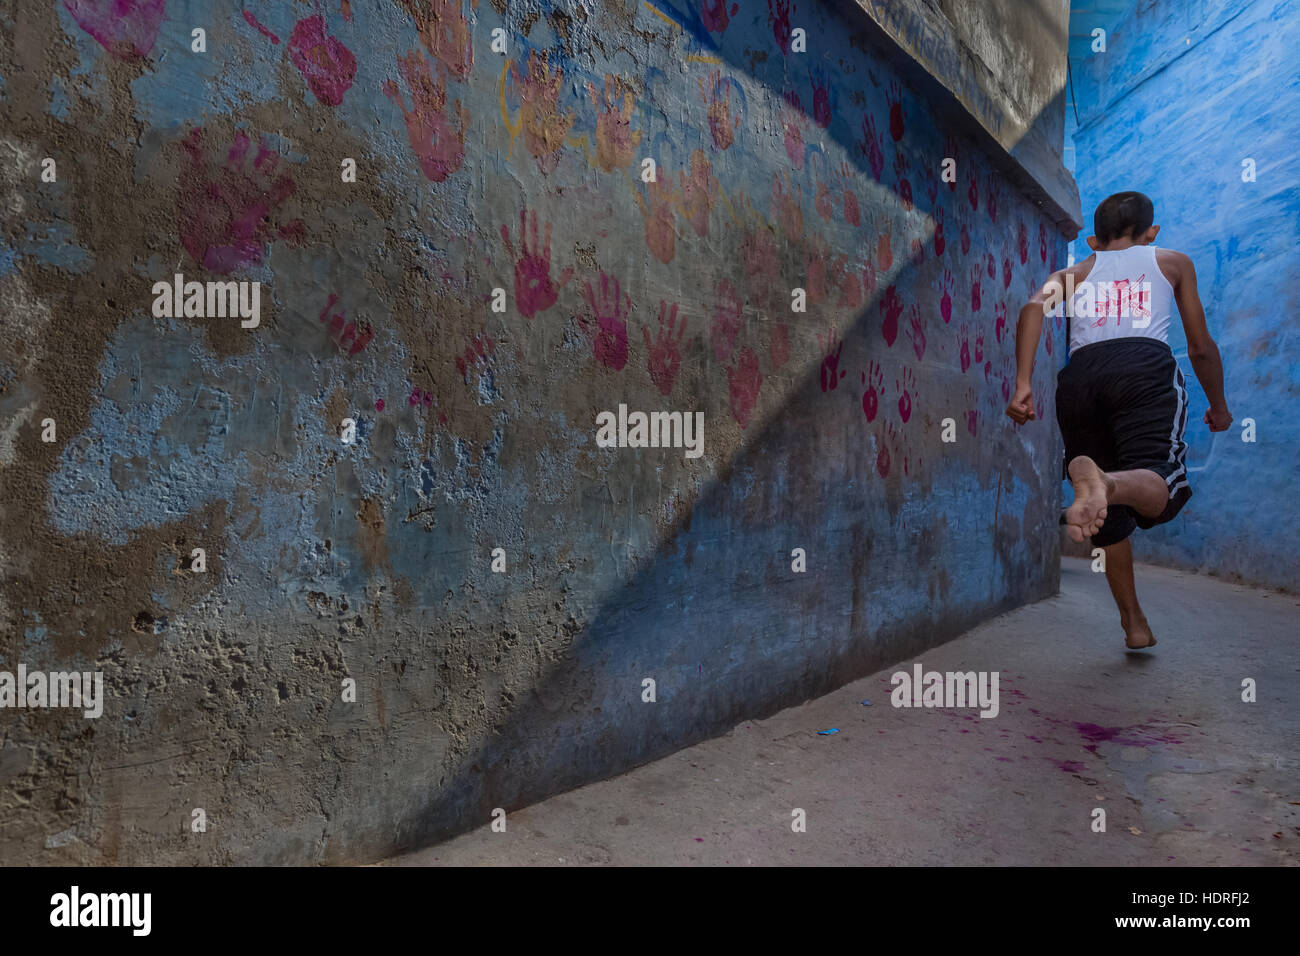 Boy running into an alley, Jodhpur, Rajasthan, India - Stock Image